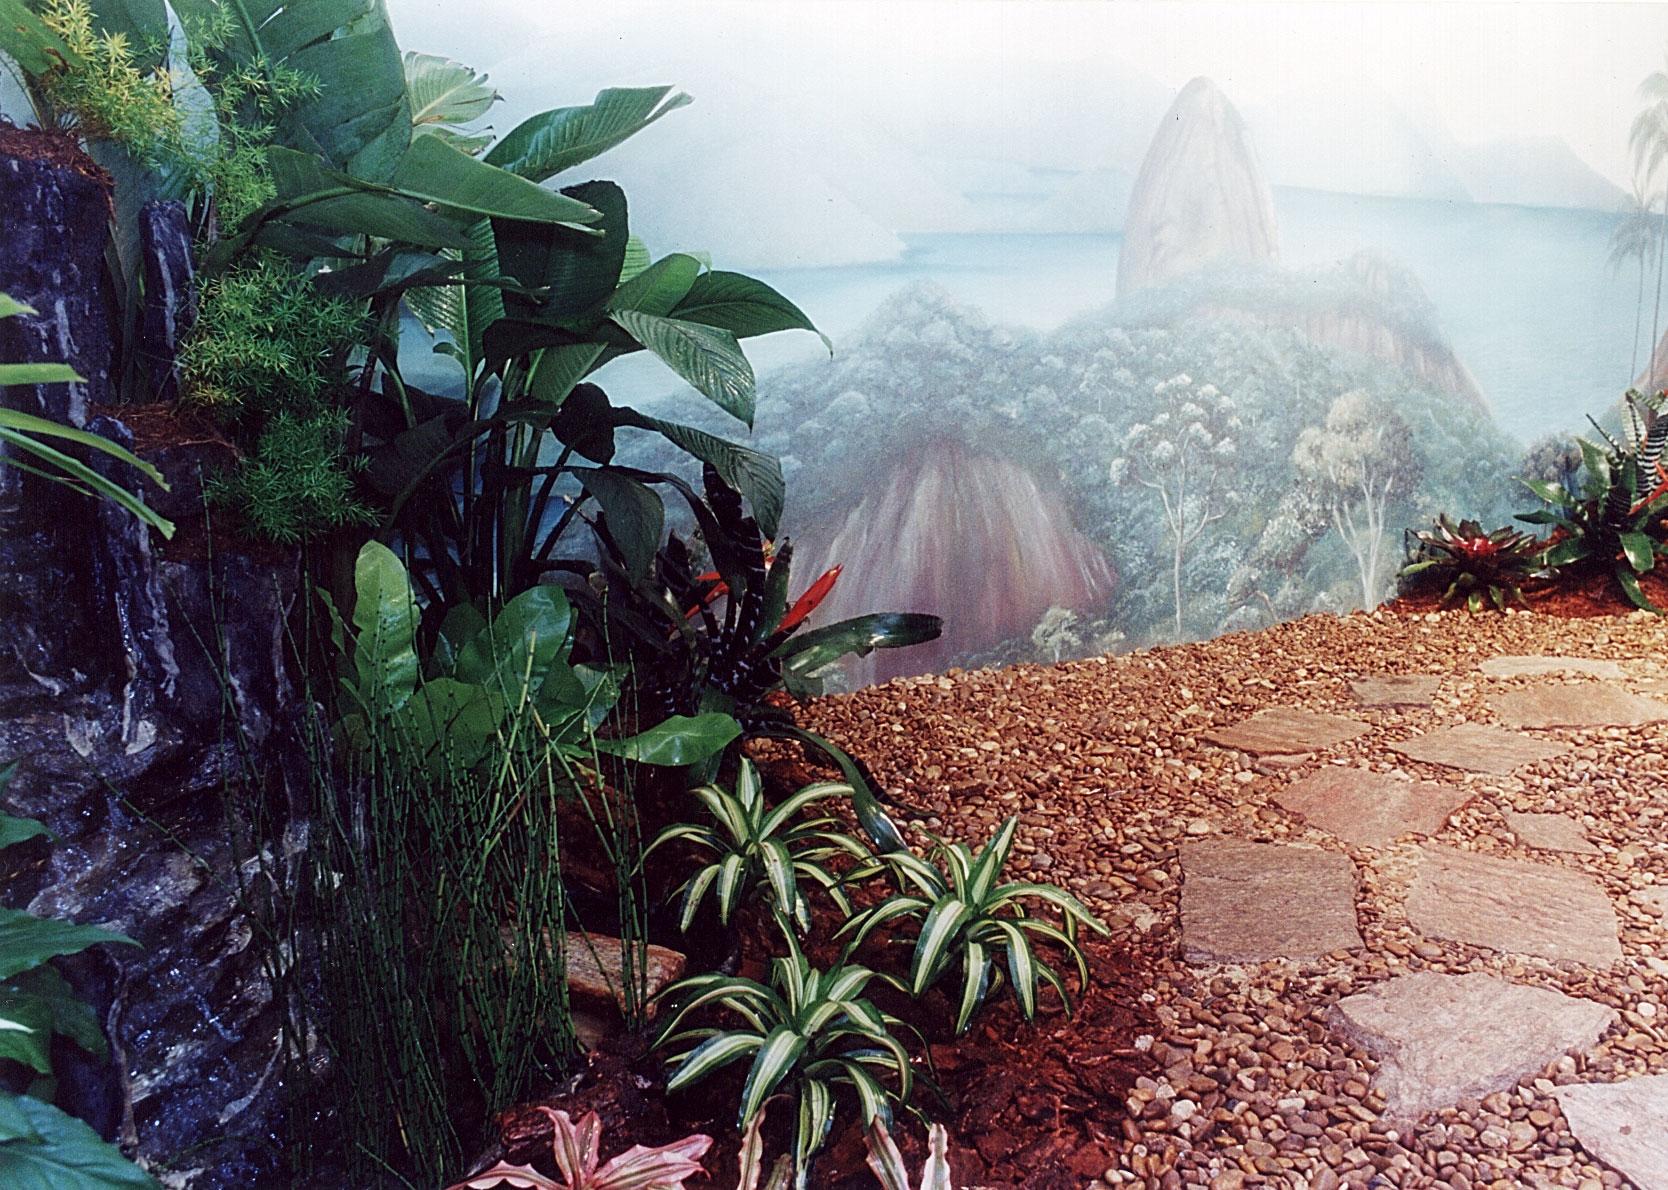 Jardins de inverno lounge RJ por Denize Barsted1